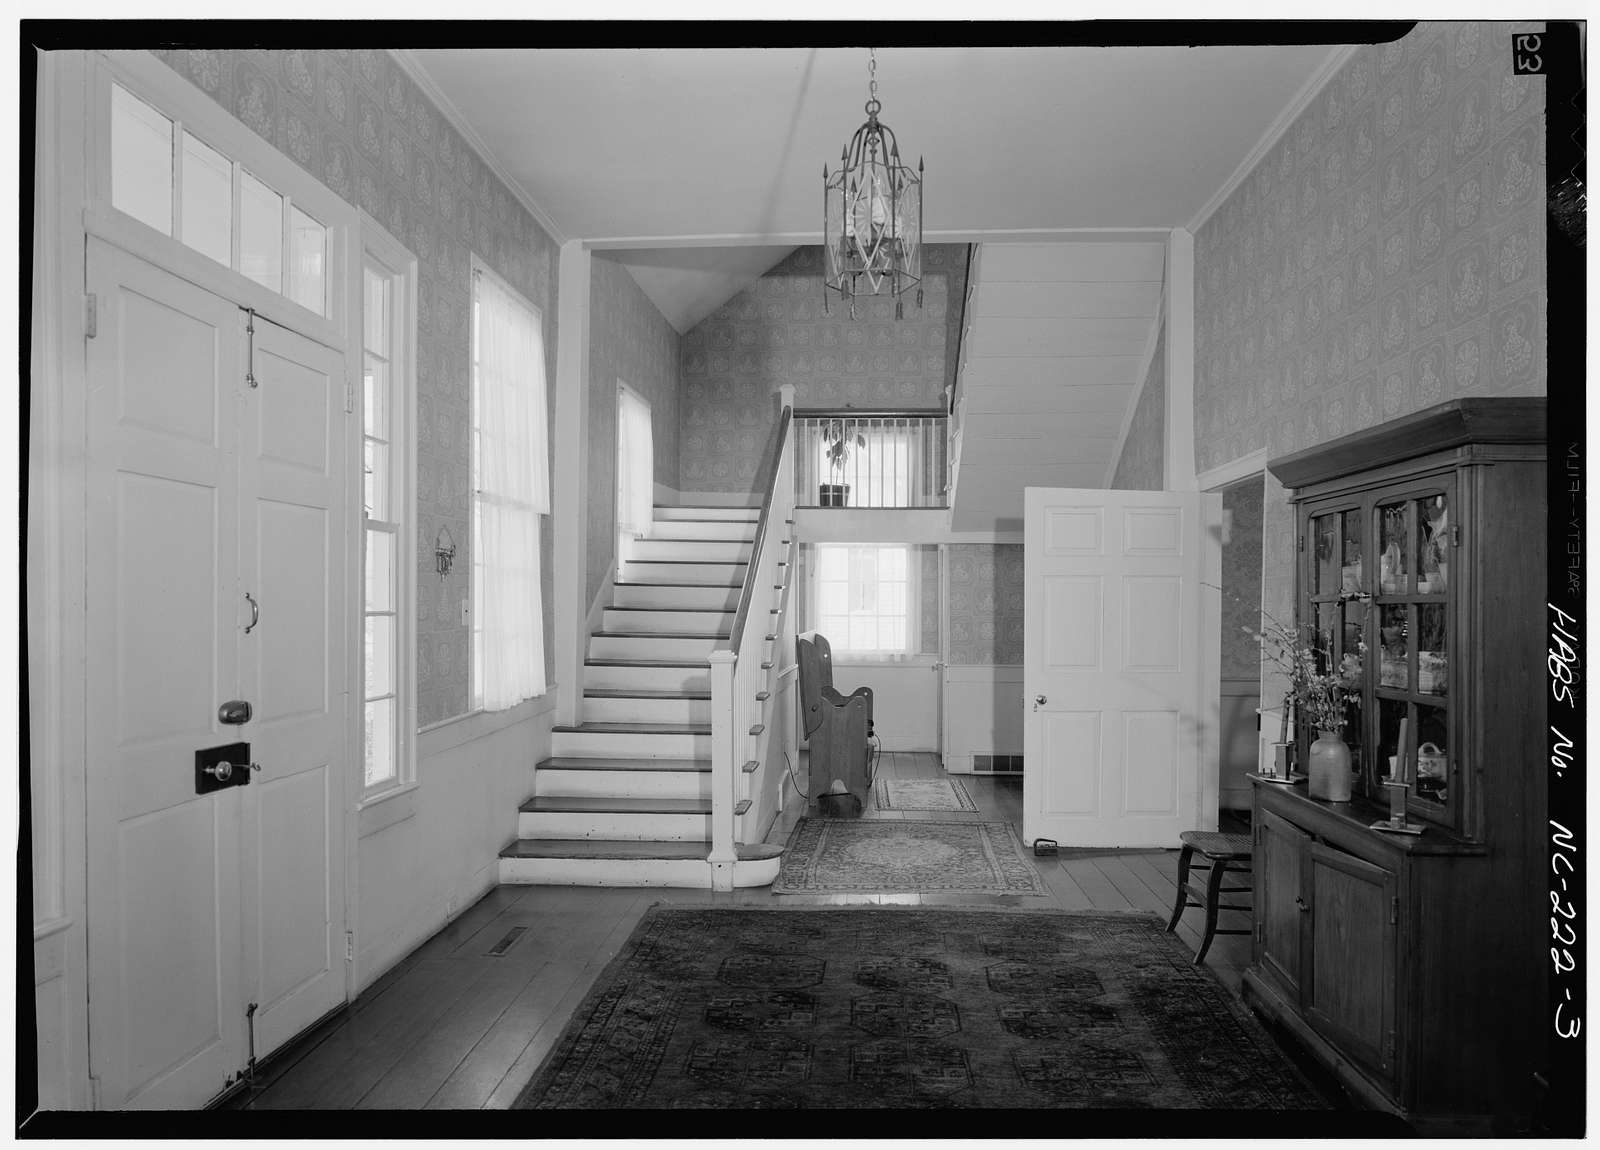 Palmer House, 173 West Margaret Lane, Hillsborough, Orange County, NC